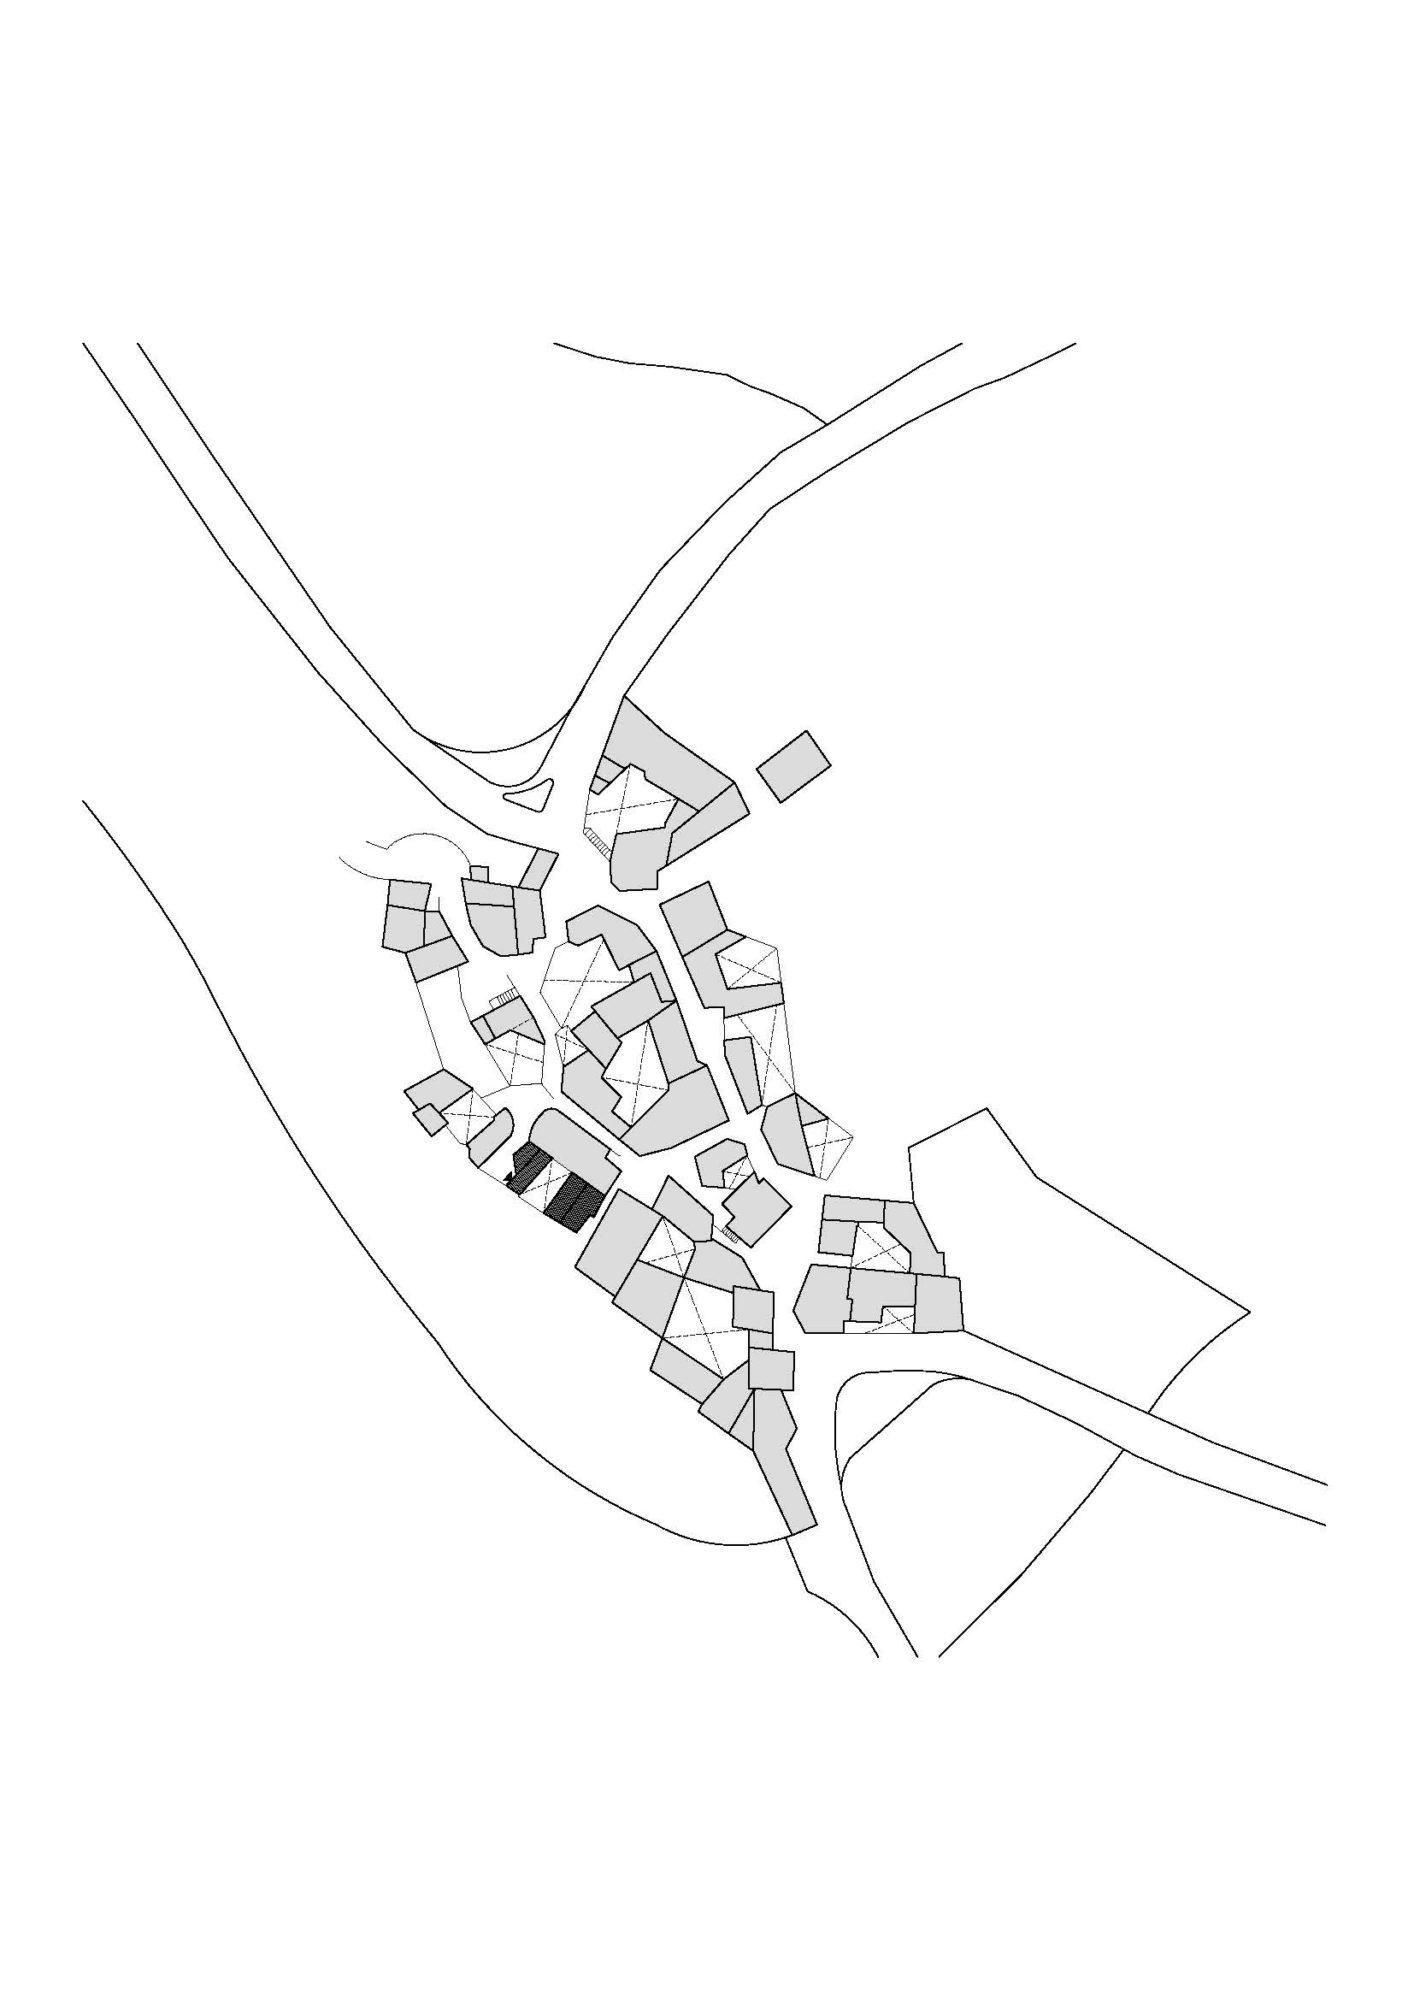 Casa Sàlmon a Travesseres - Garcés - de Seta - Bonet